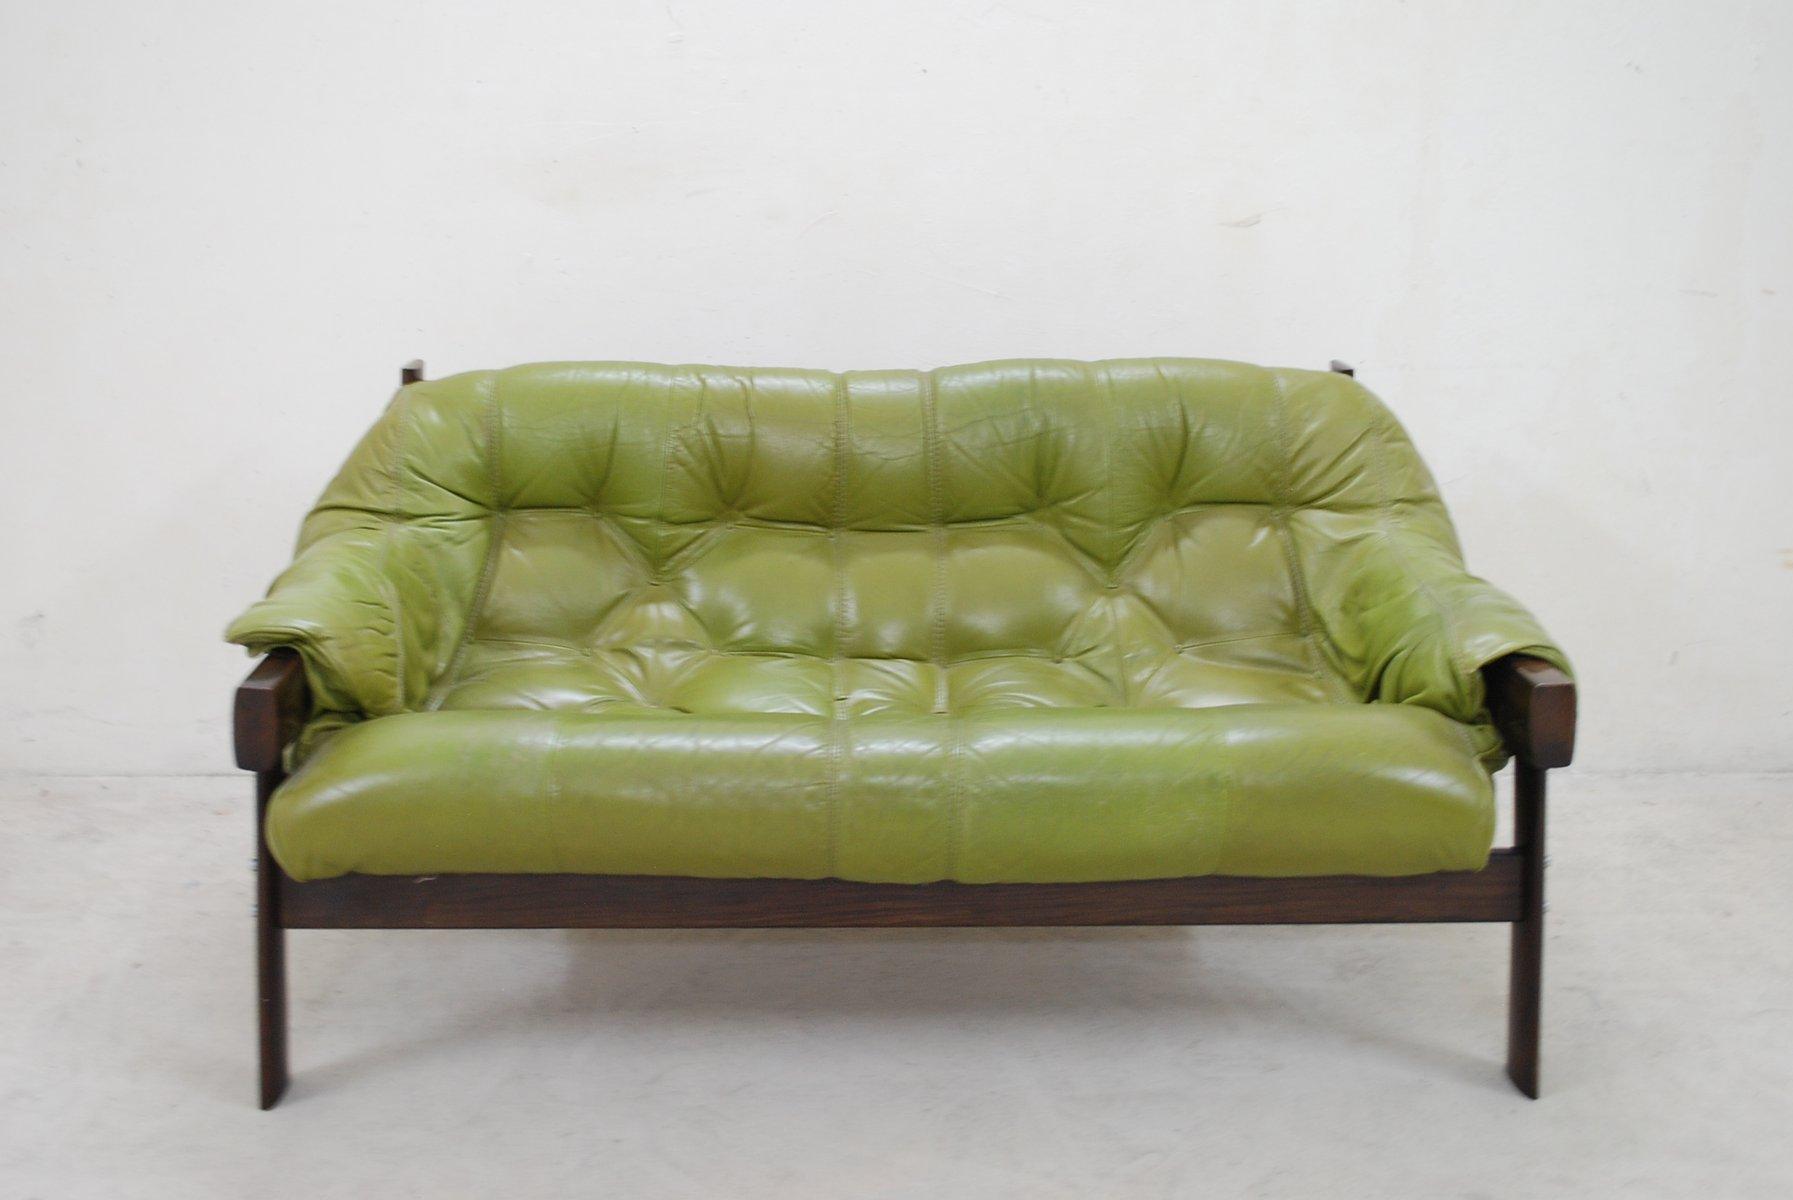 Dansk Leather Sofas Www Looksisquare Com